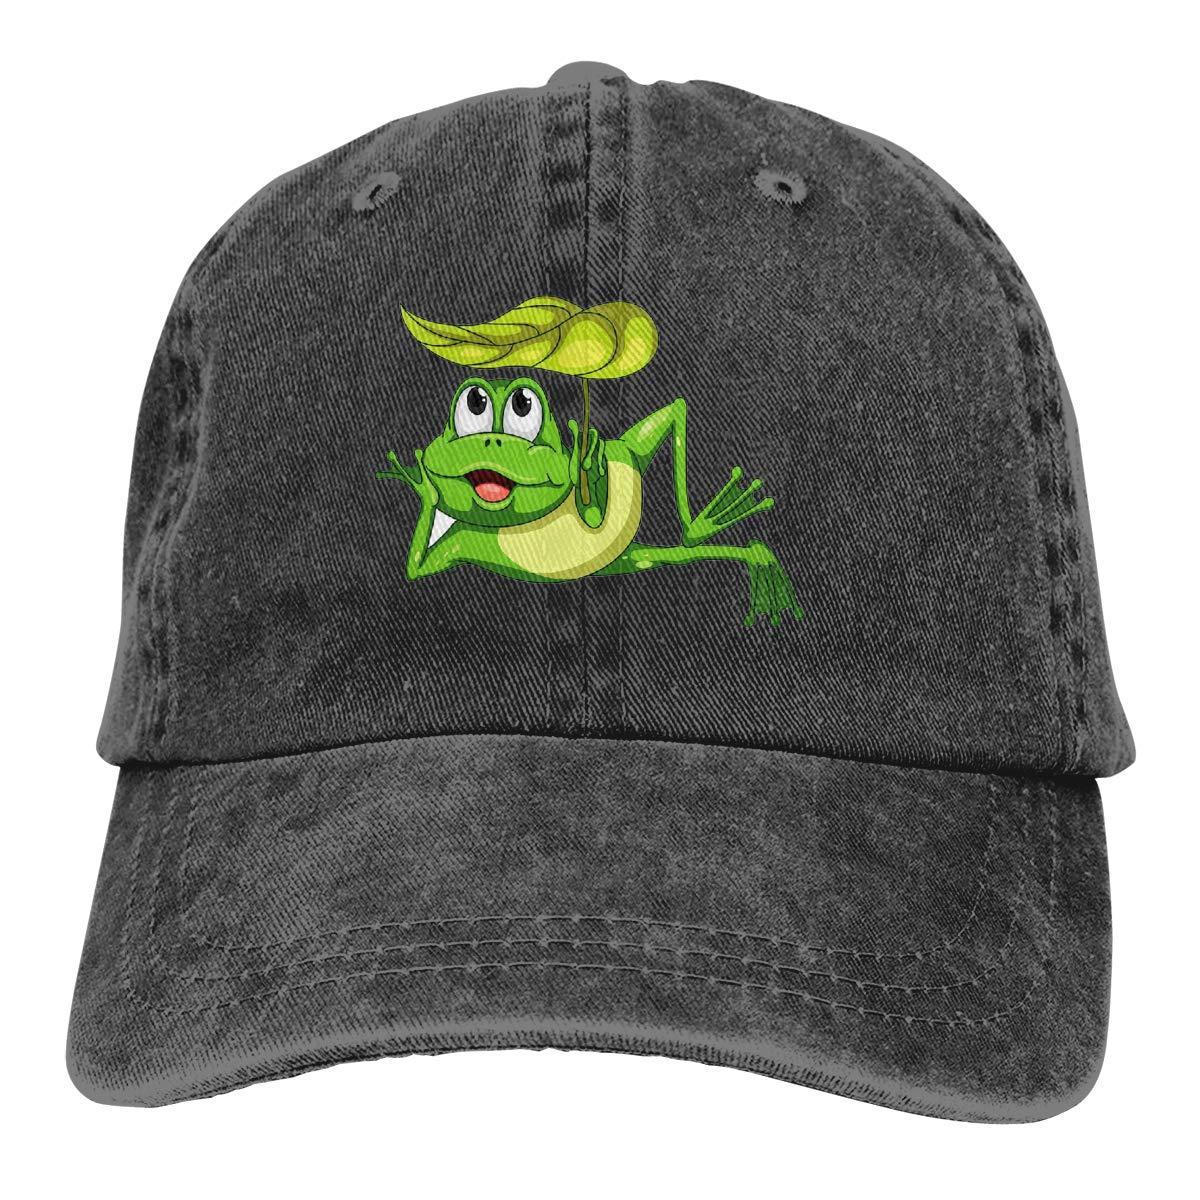 Qbeir Adult Unisex Cowboy Cap Adjustable Hat Summer Cartoon Frog Cotton Denim